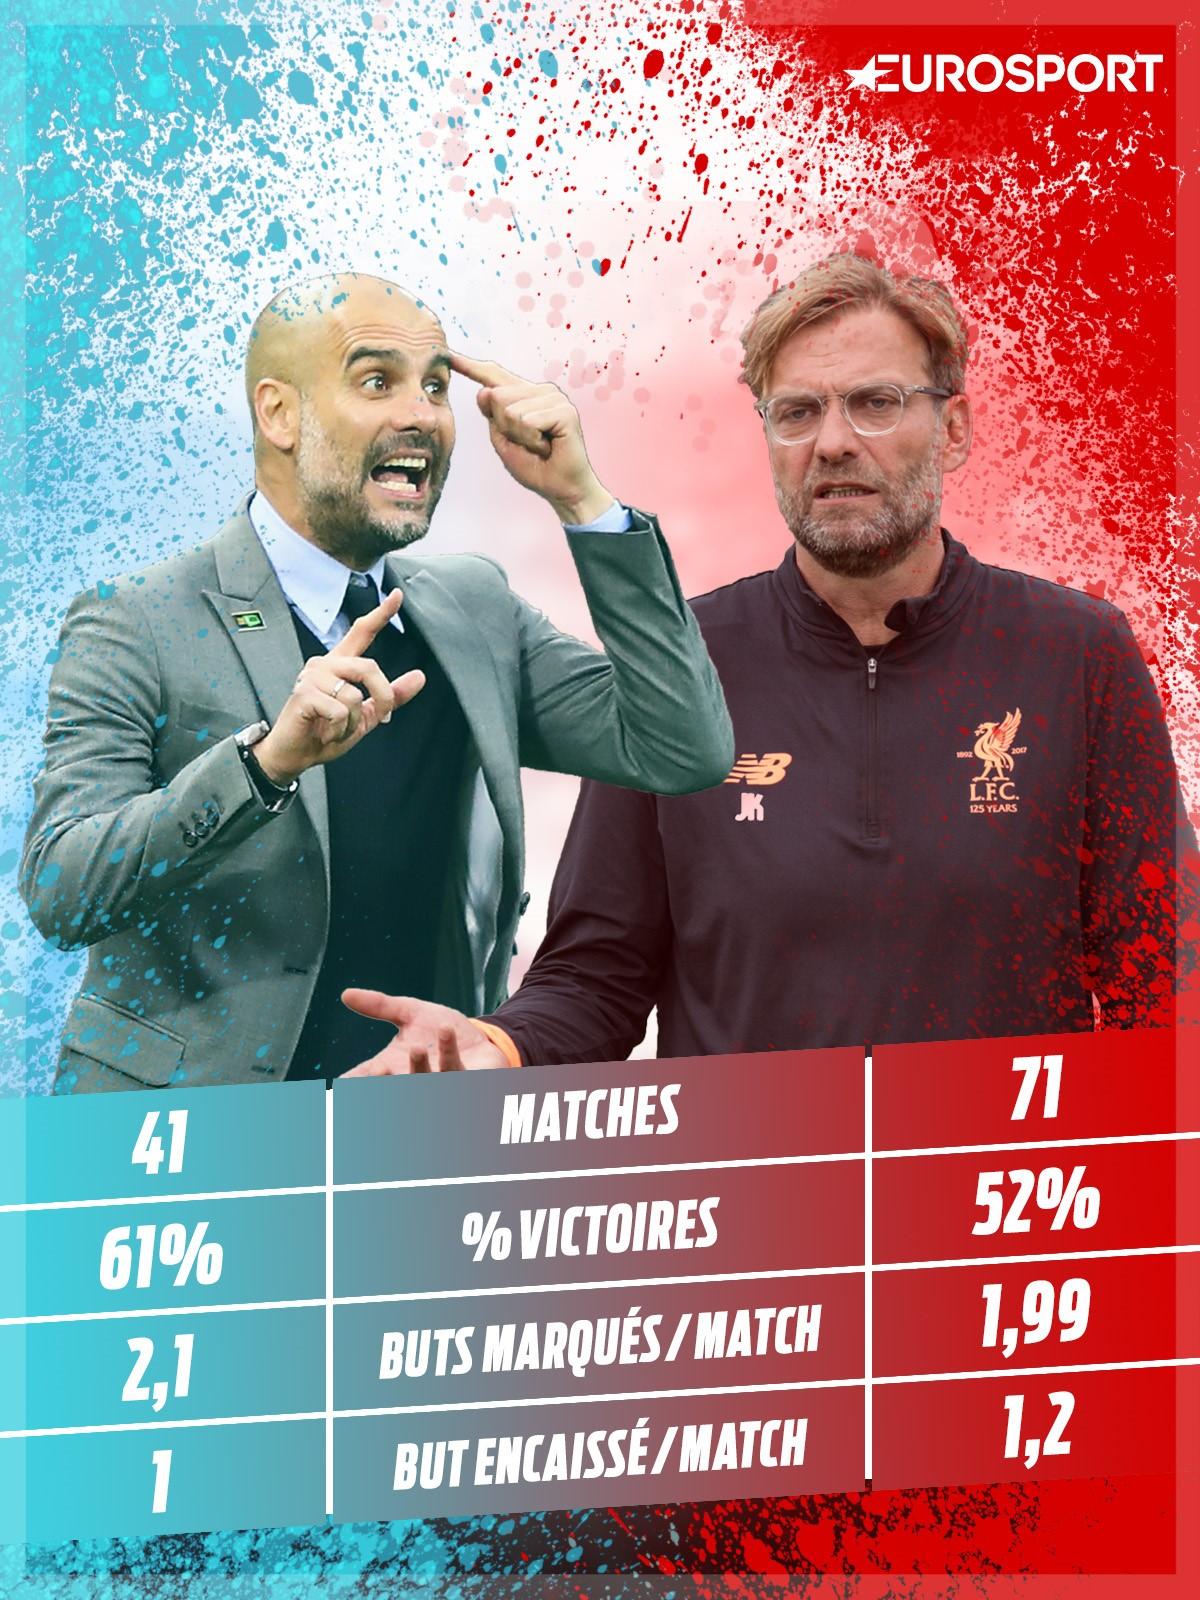 Visuel : Pep Guardiola vs Jurgen Klopp en Premier League